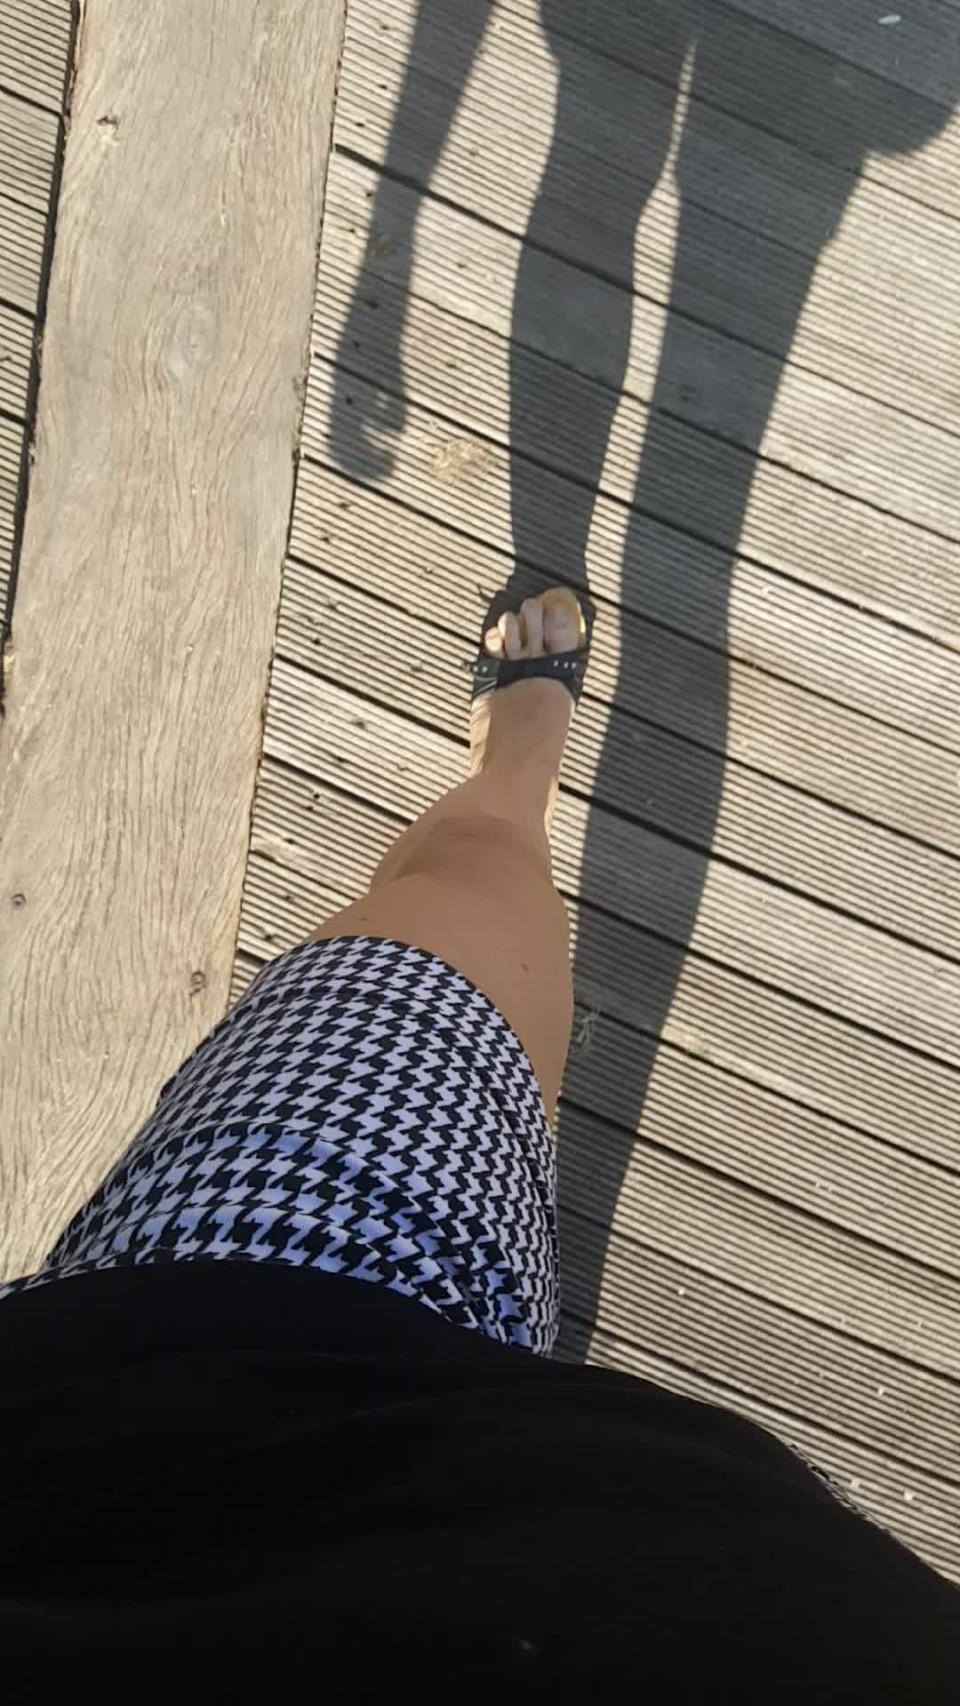 [Full HD] spanishstar walking with my wood mules pov spanishstar - ManyVids-00:05:08 | Feet,Shoe Fetish,Toe Fetish,Toenail Fetish,MILF - 634,6 MB